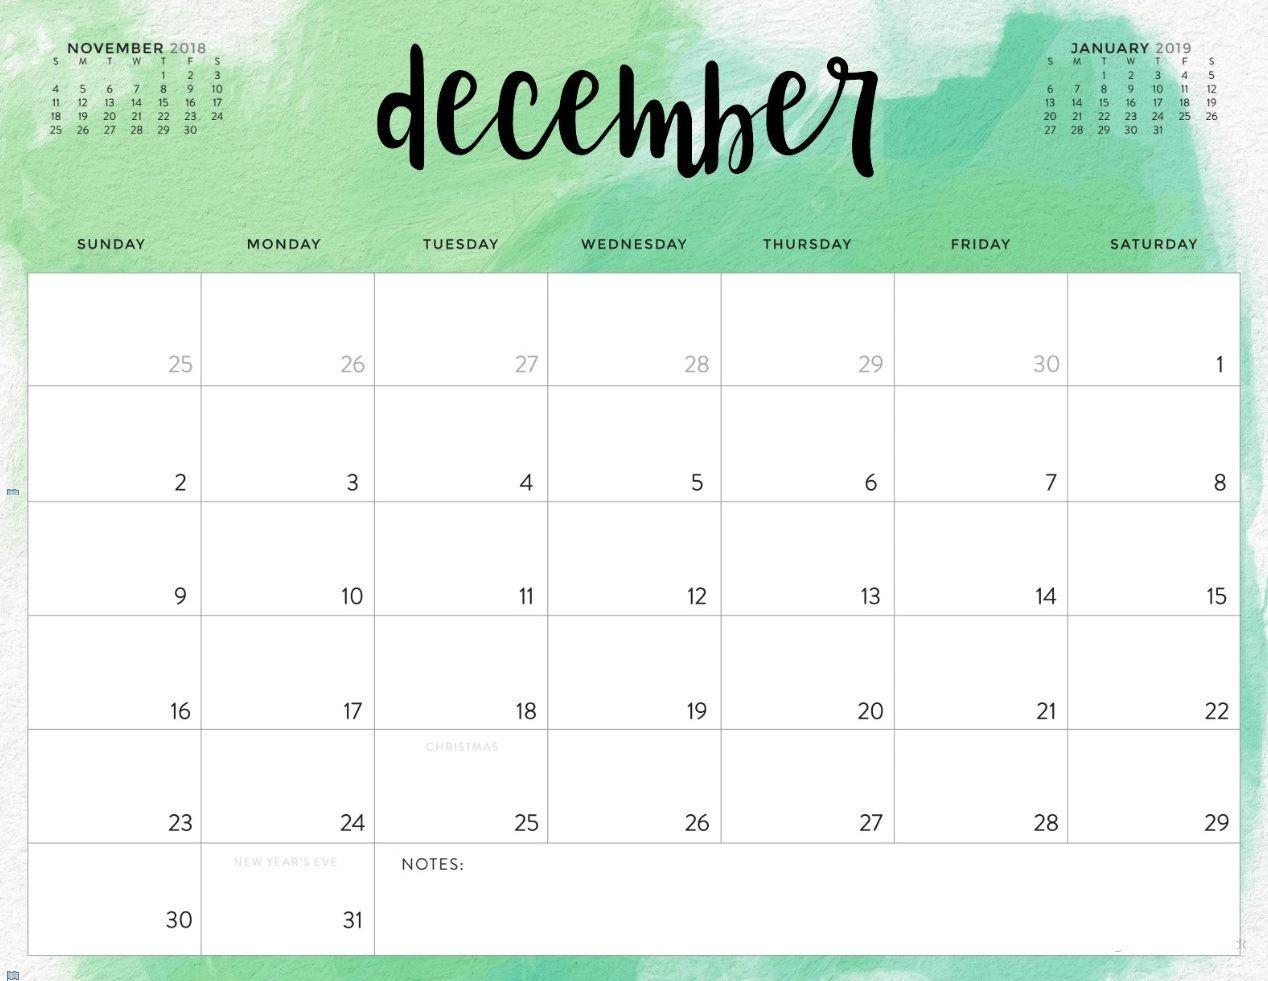 December 2018 Calendar With Holidays Notes | Printable